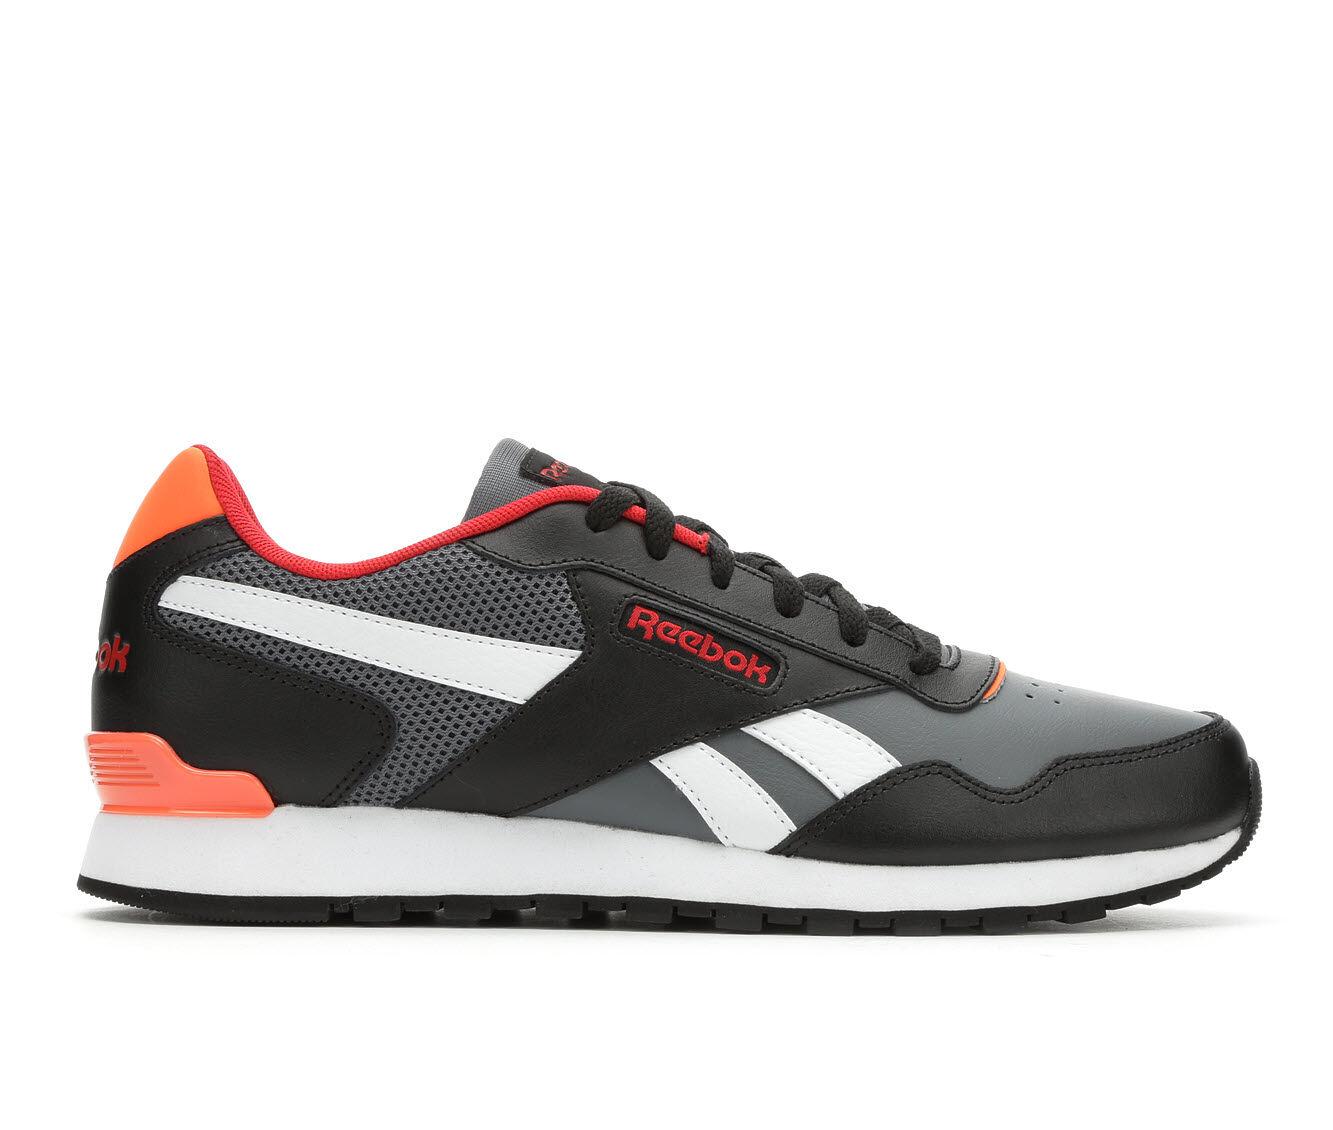 uk shoes_kd1426